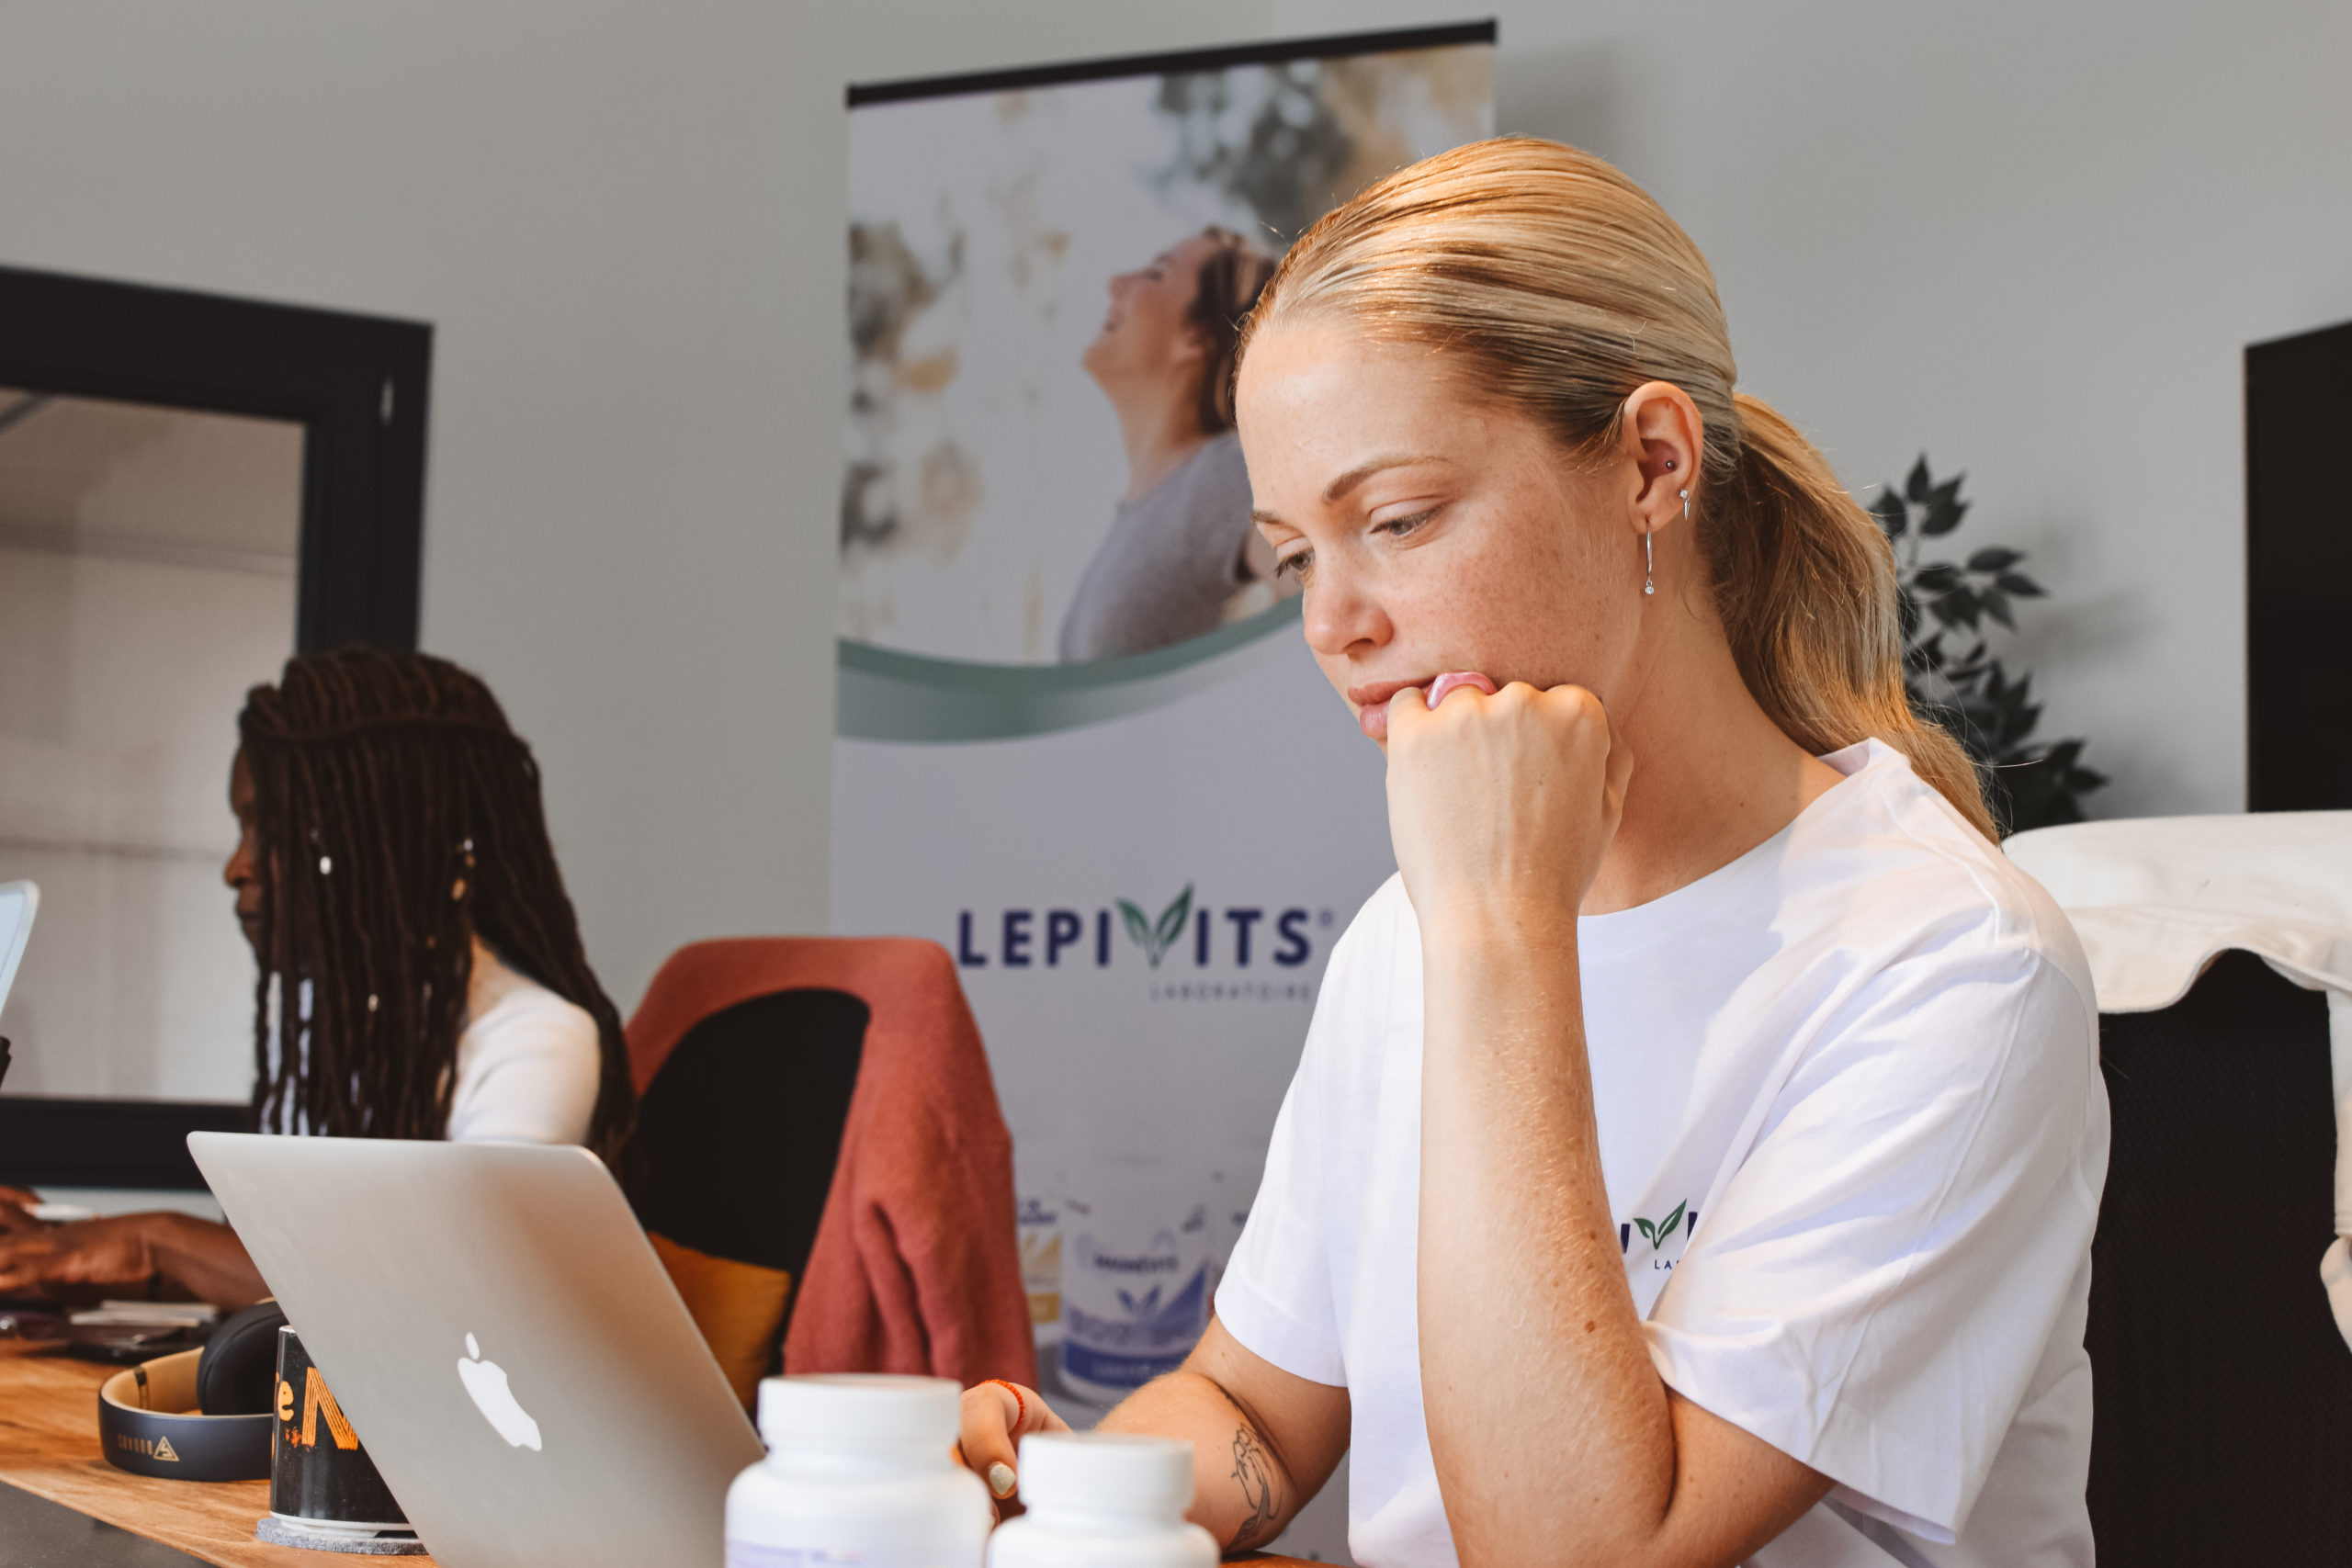 Lepivits x Meet My Job - 3